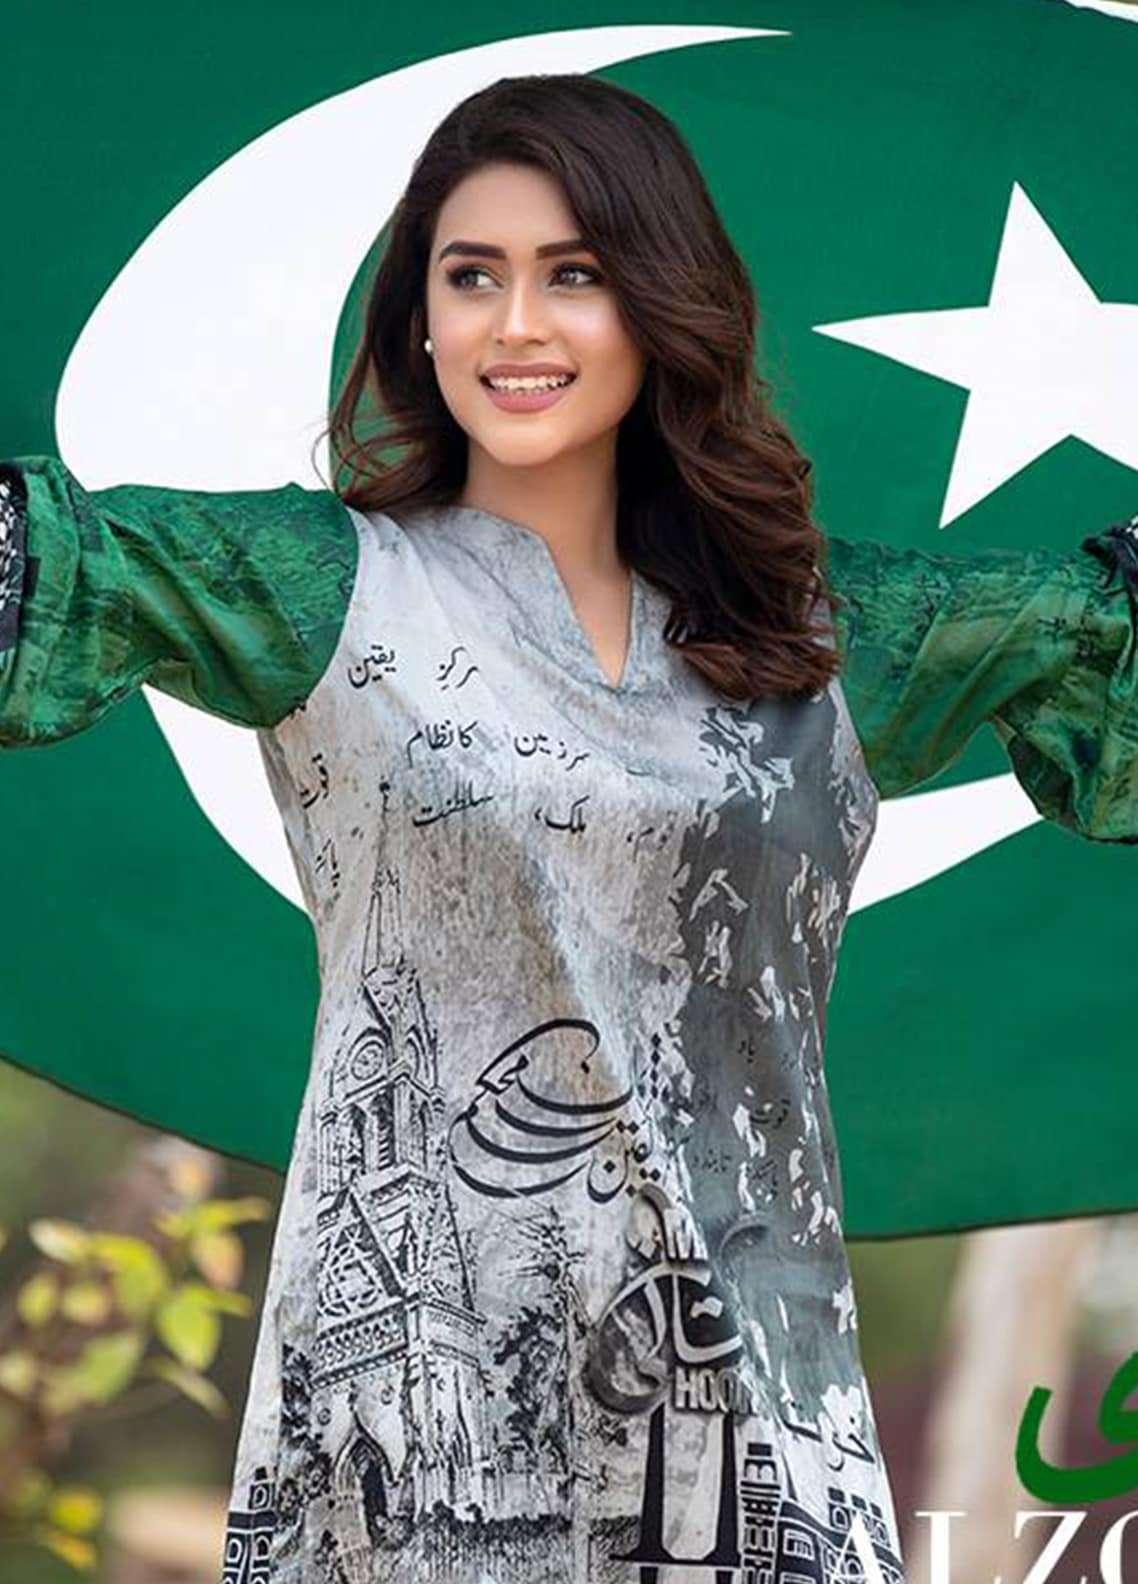 Al Zohaib Printed Cotton Silk Unstitched Kurties AZ18AK 03 - Independence Outfit